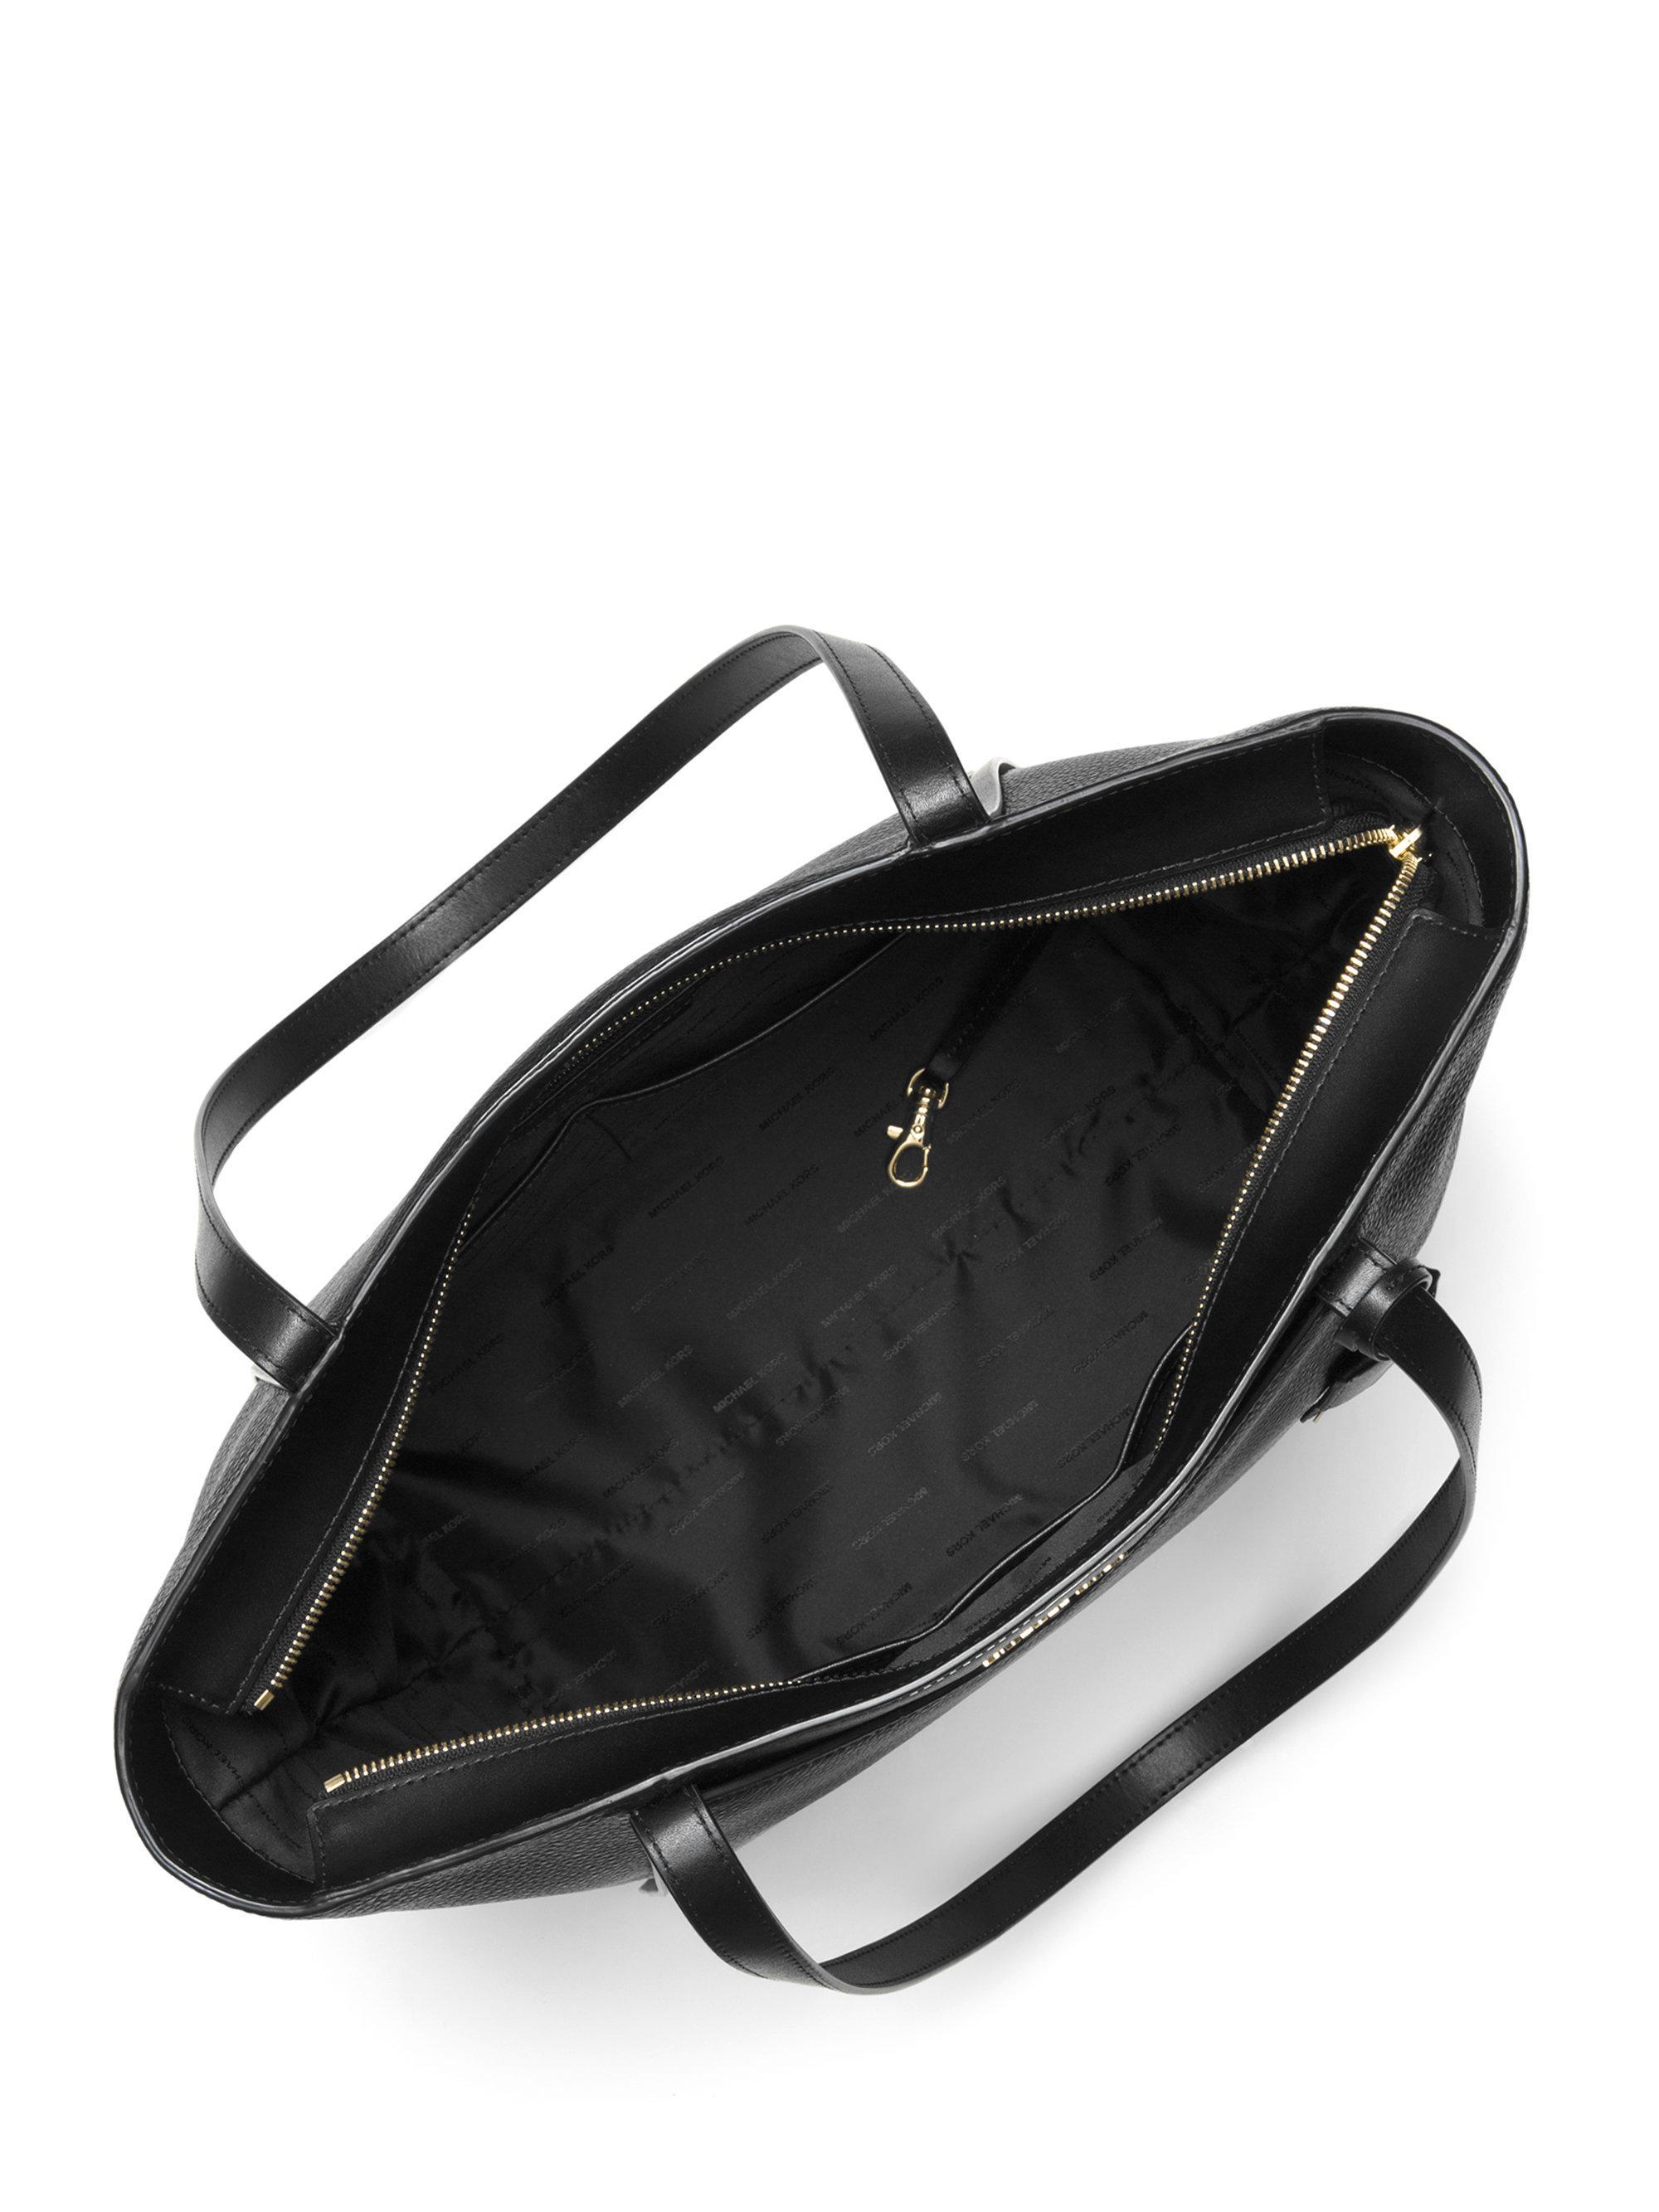 47c45621b99 MICHAEL Michael Kors - Black Large Leather Tote Bag - Lyst. View fullscreen